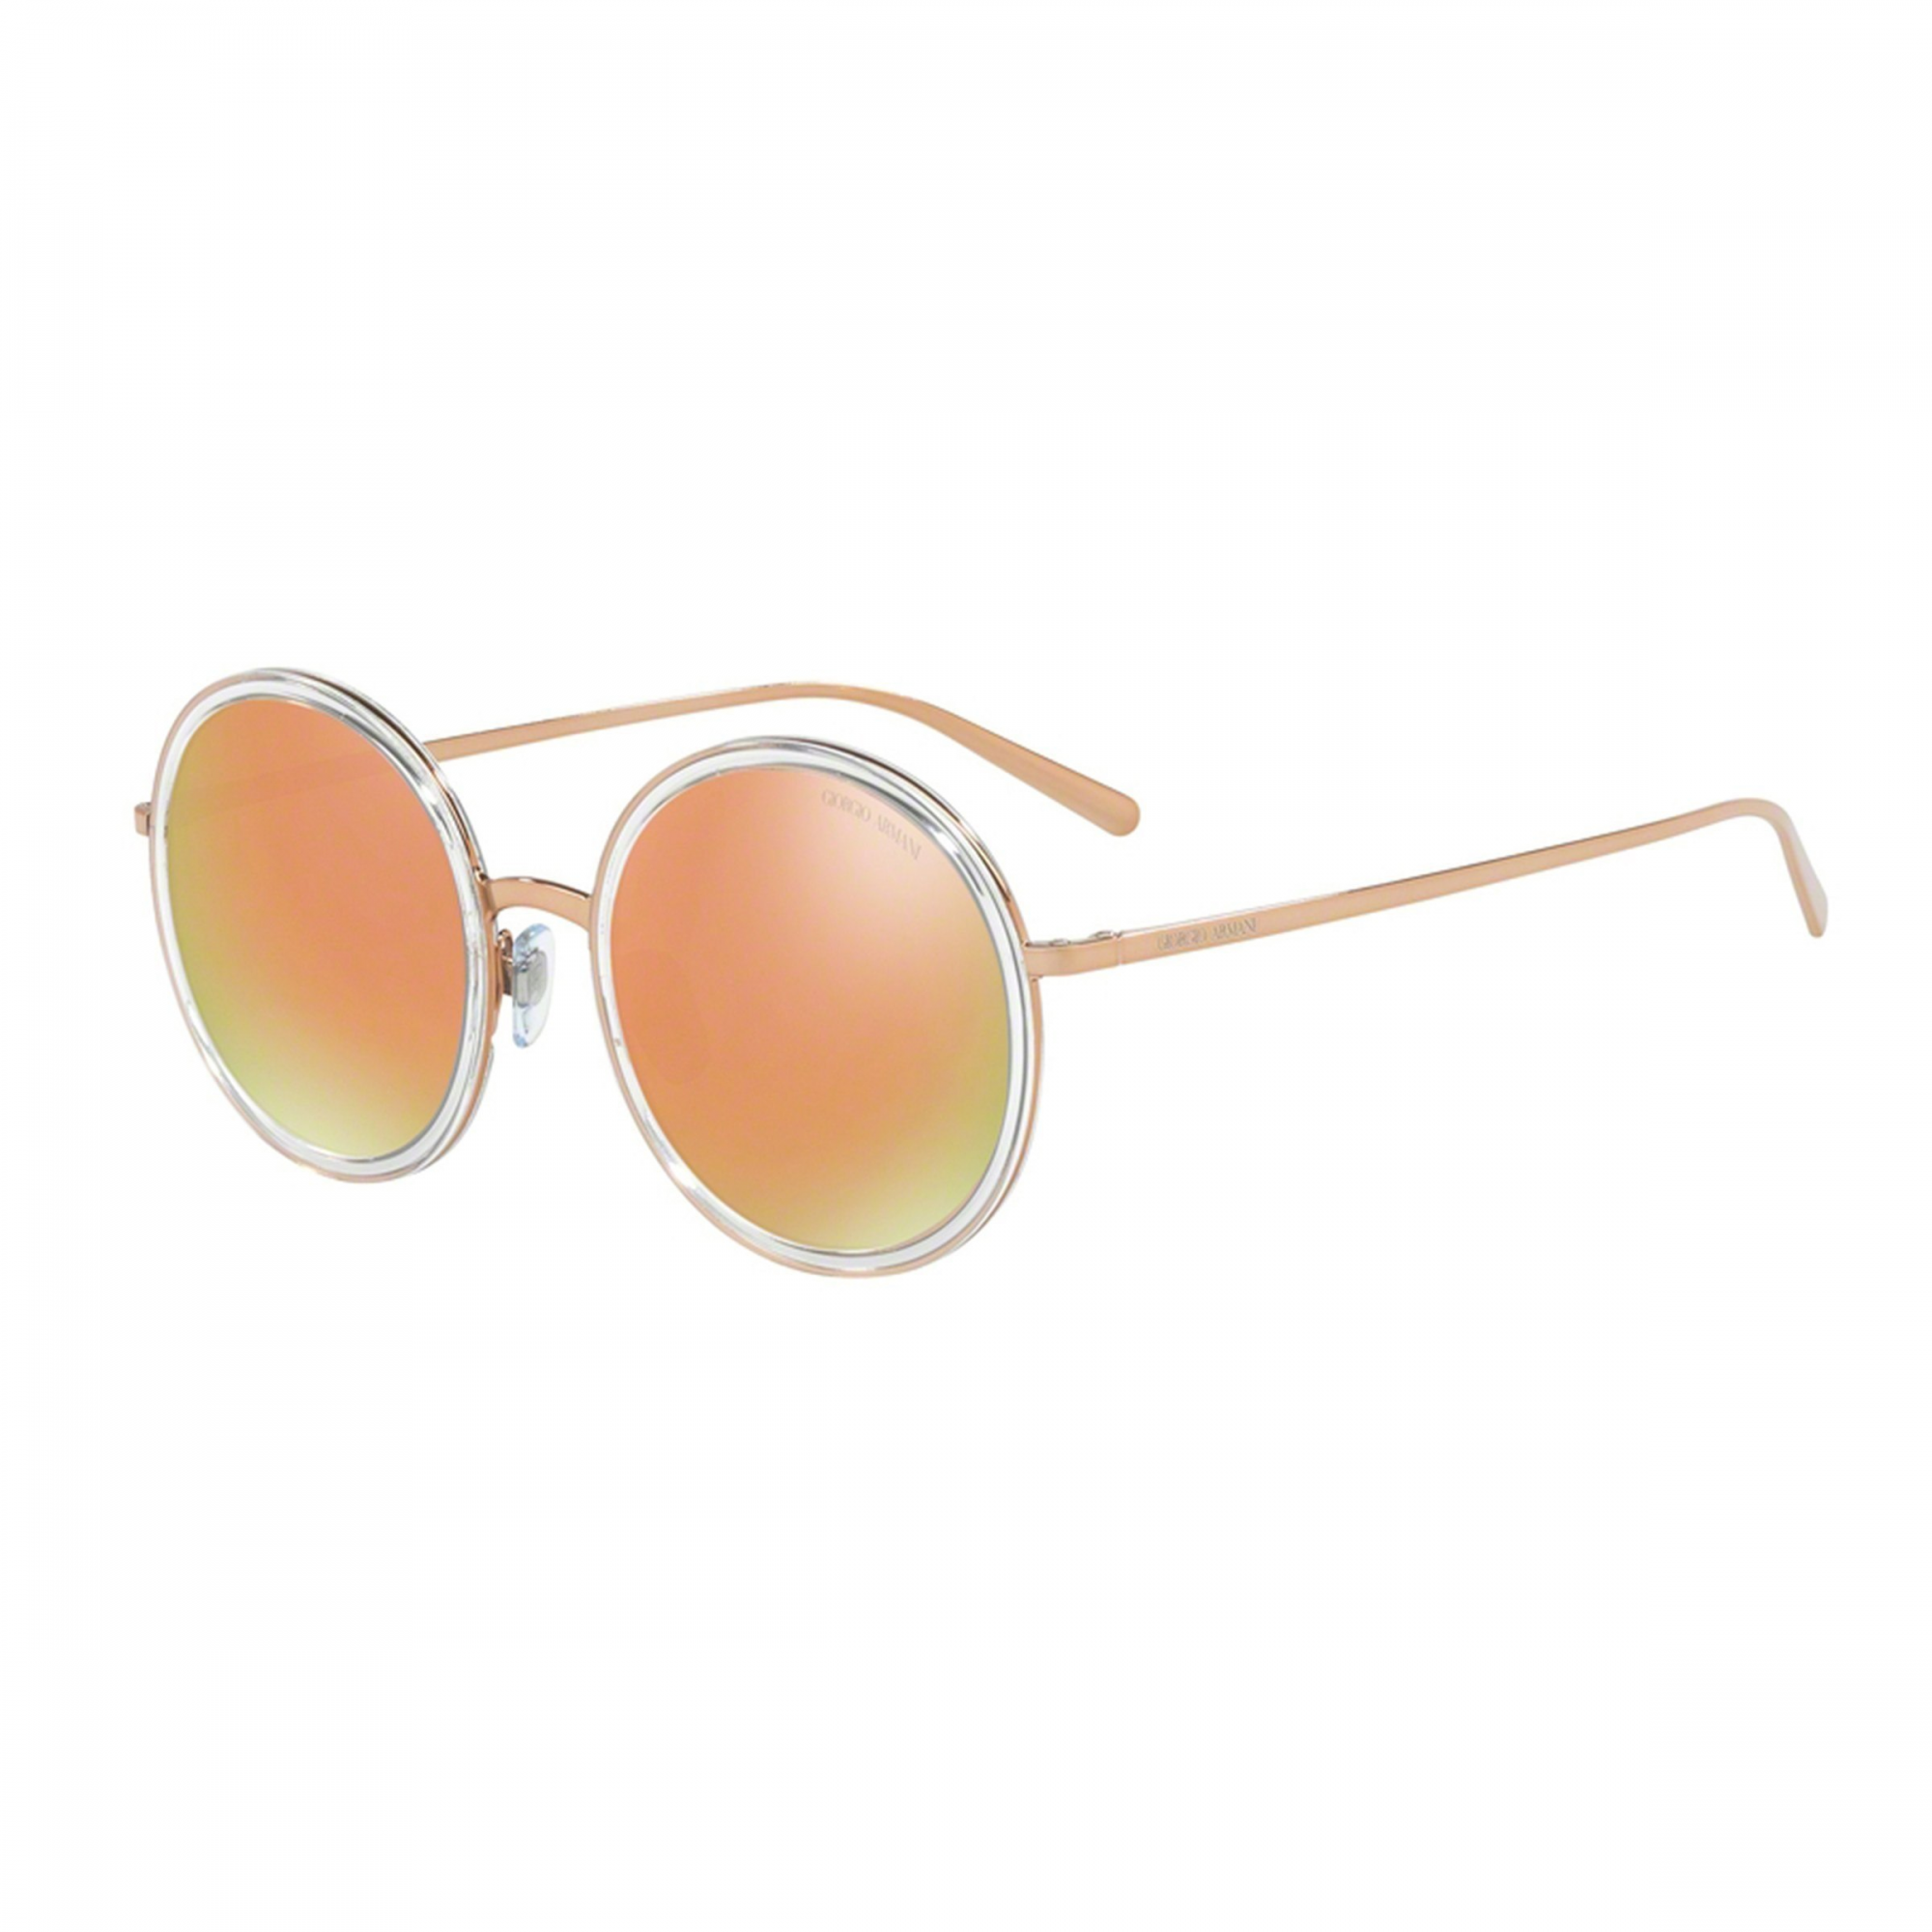 Óculos de Sol Feminino Giorgio Armani AR 6052 Rosê Gold